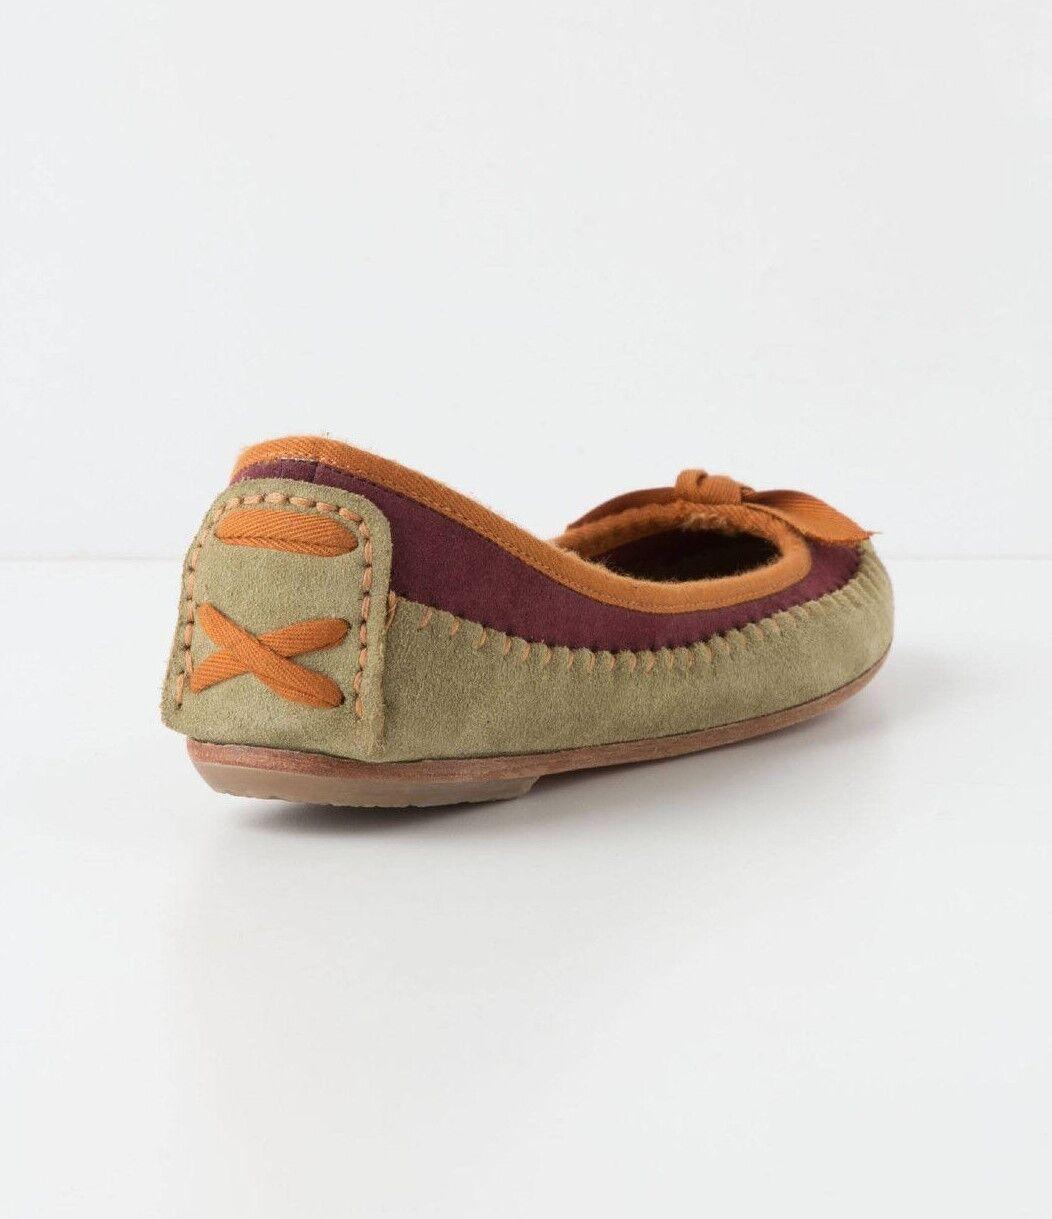 Anthropologie JASPER JEERA 37 Moccasin Suede Suede Moccasin Ballet Flats Schuhes  128 NWT 77af20